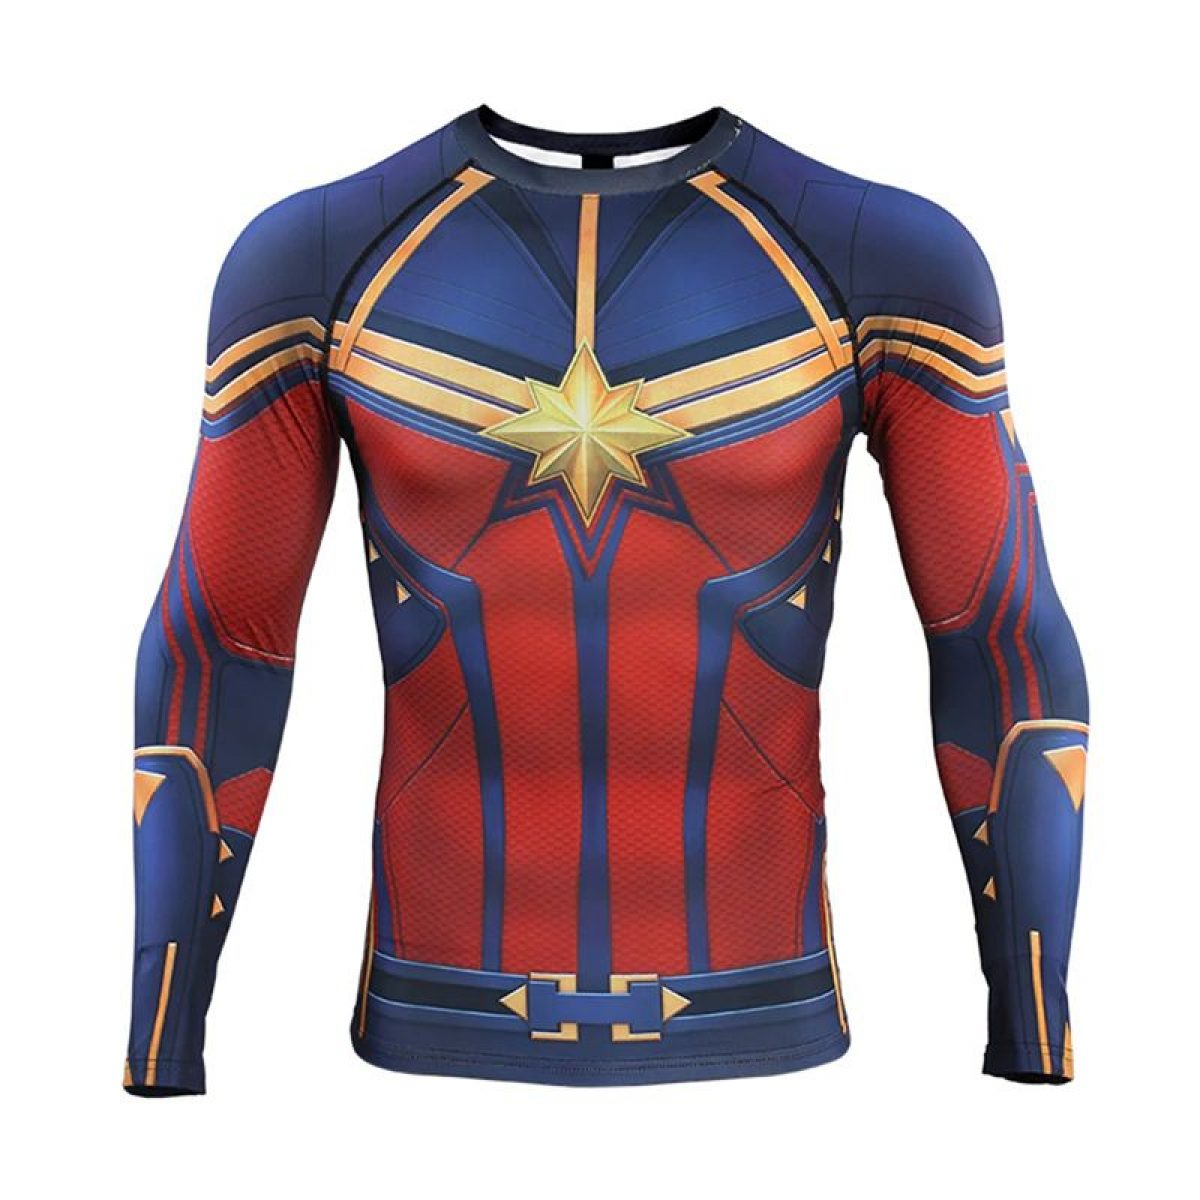 AVENGERS Marvel DC SUPERHERO COSPLAY COMPRESSION PREMIUM Fitness T-SHIRT GYM TOP